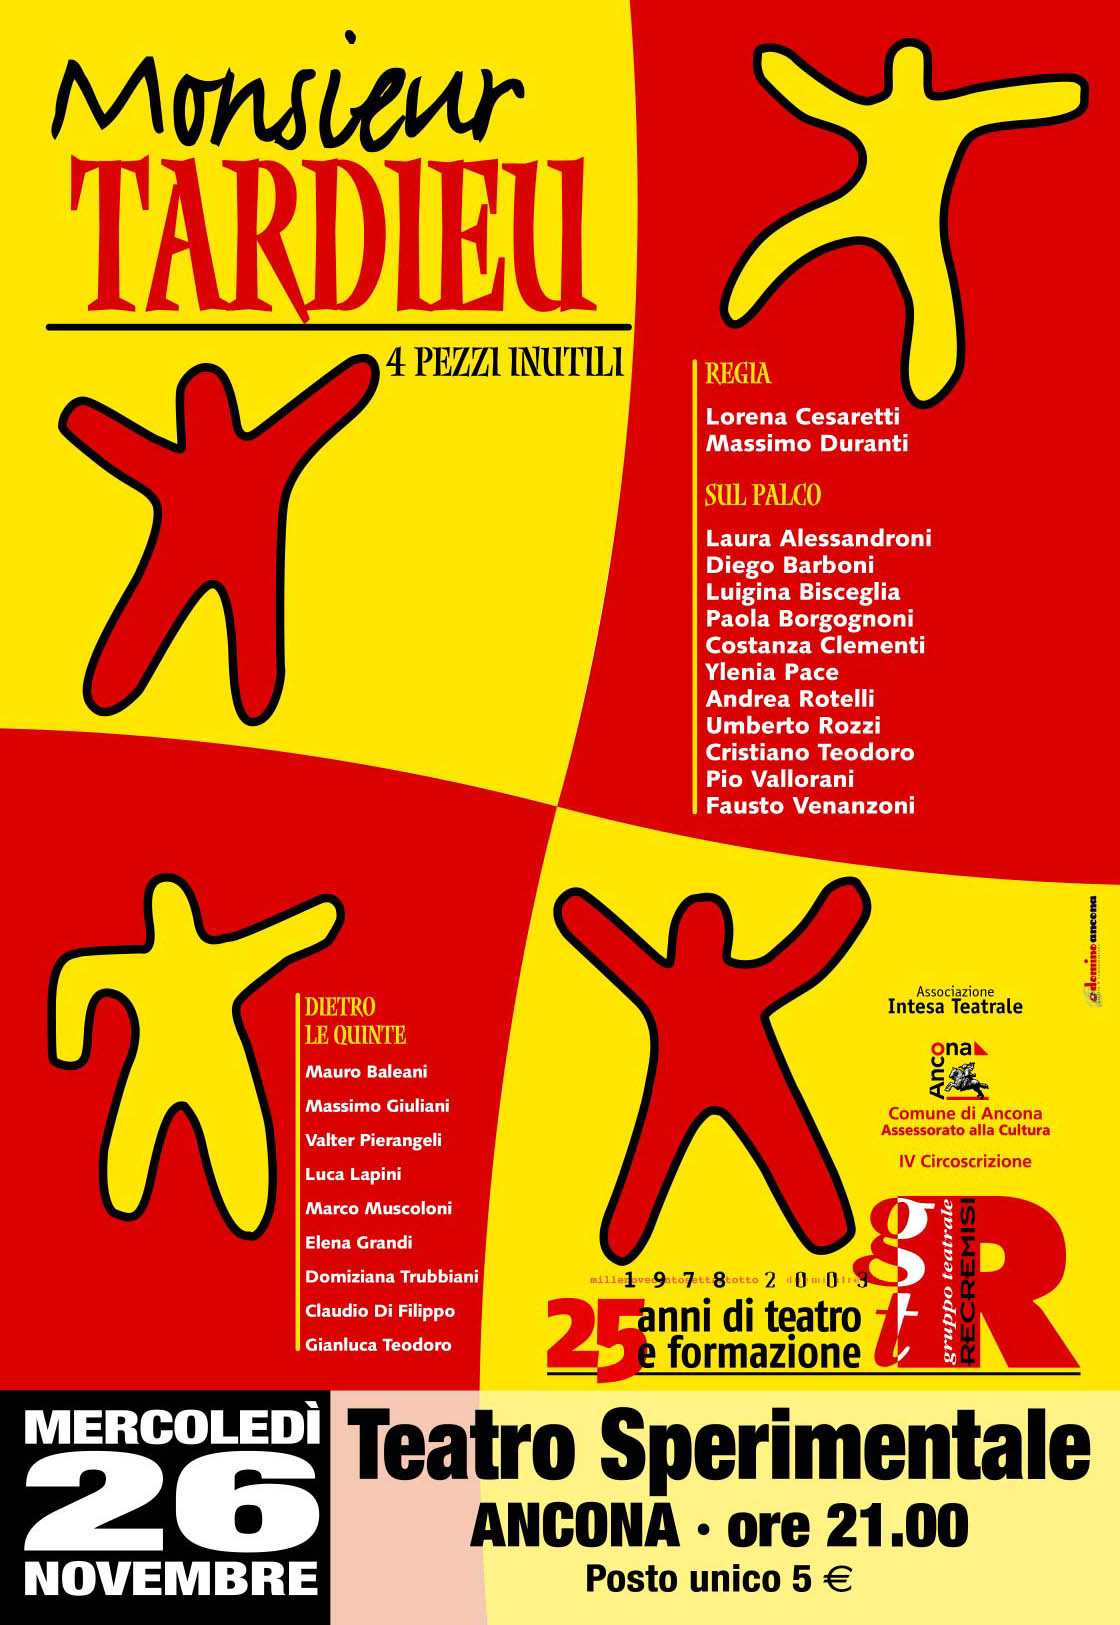 Monsieur TARDIEU - 4 pezzi inutili